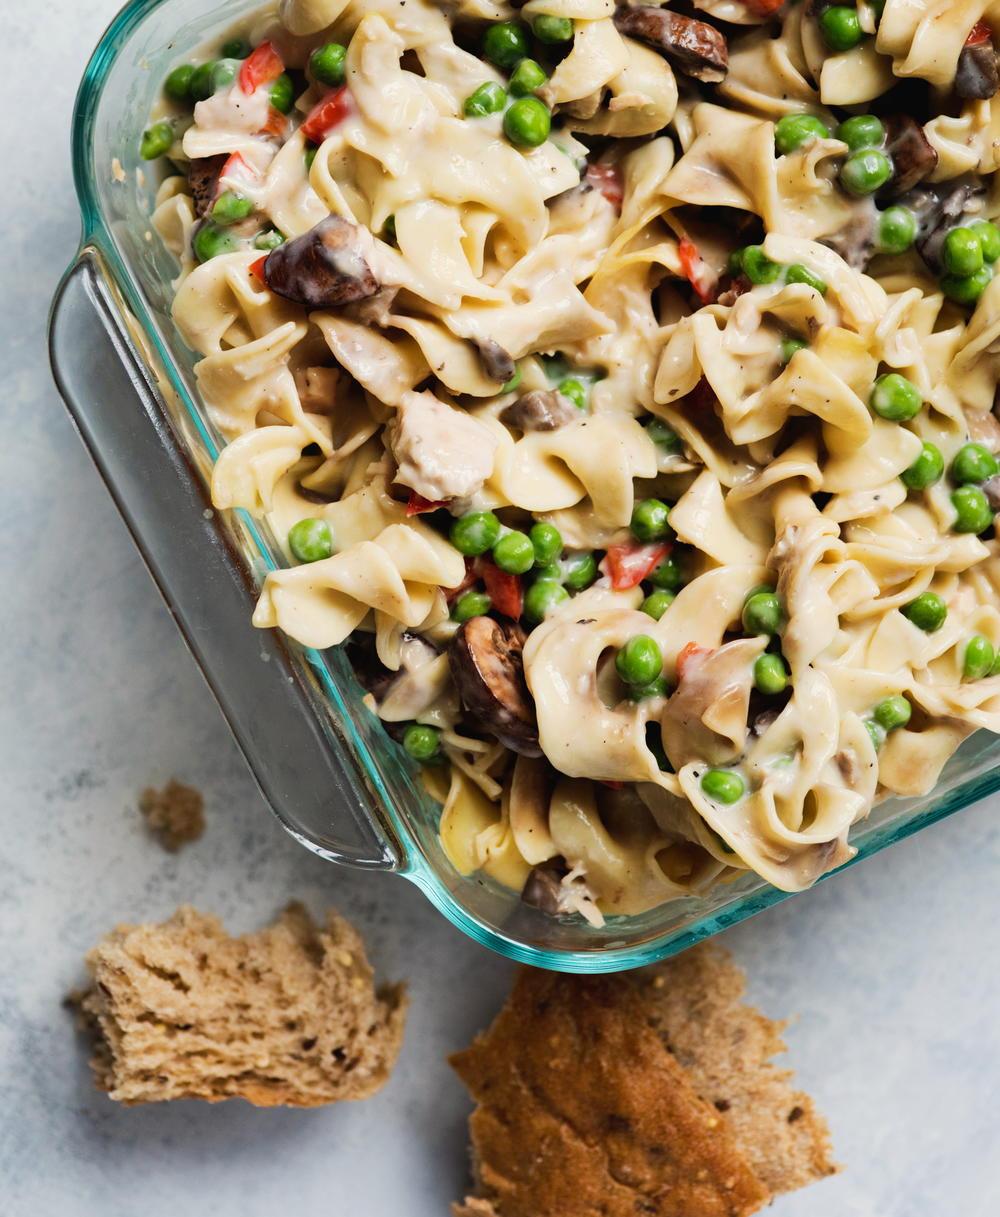 Tuna Noodle Casserole With Cream Of Mushroom Soup  Tuna Noodle Casserole with Cream of Mushroom Soup